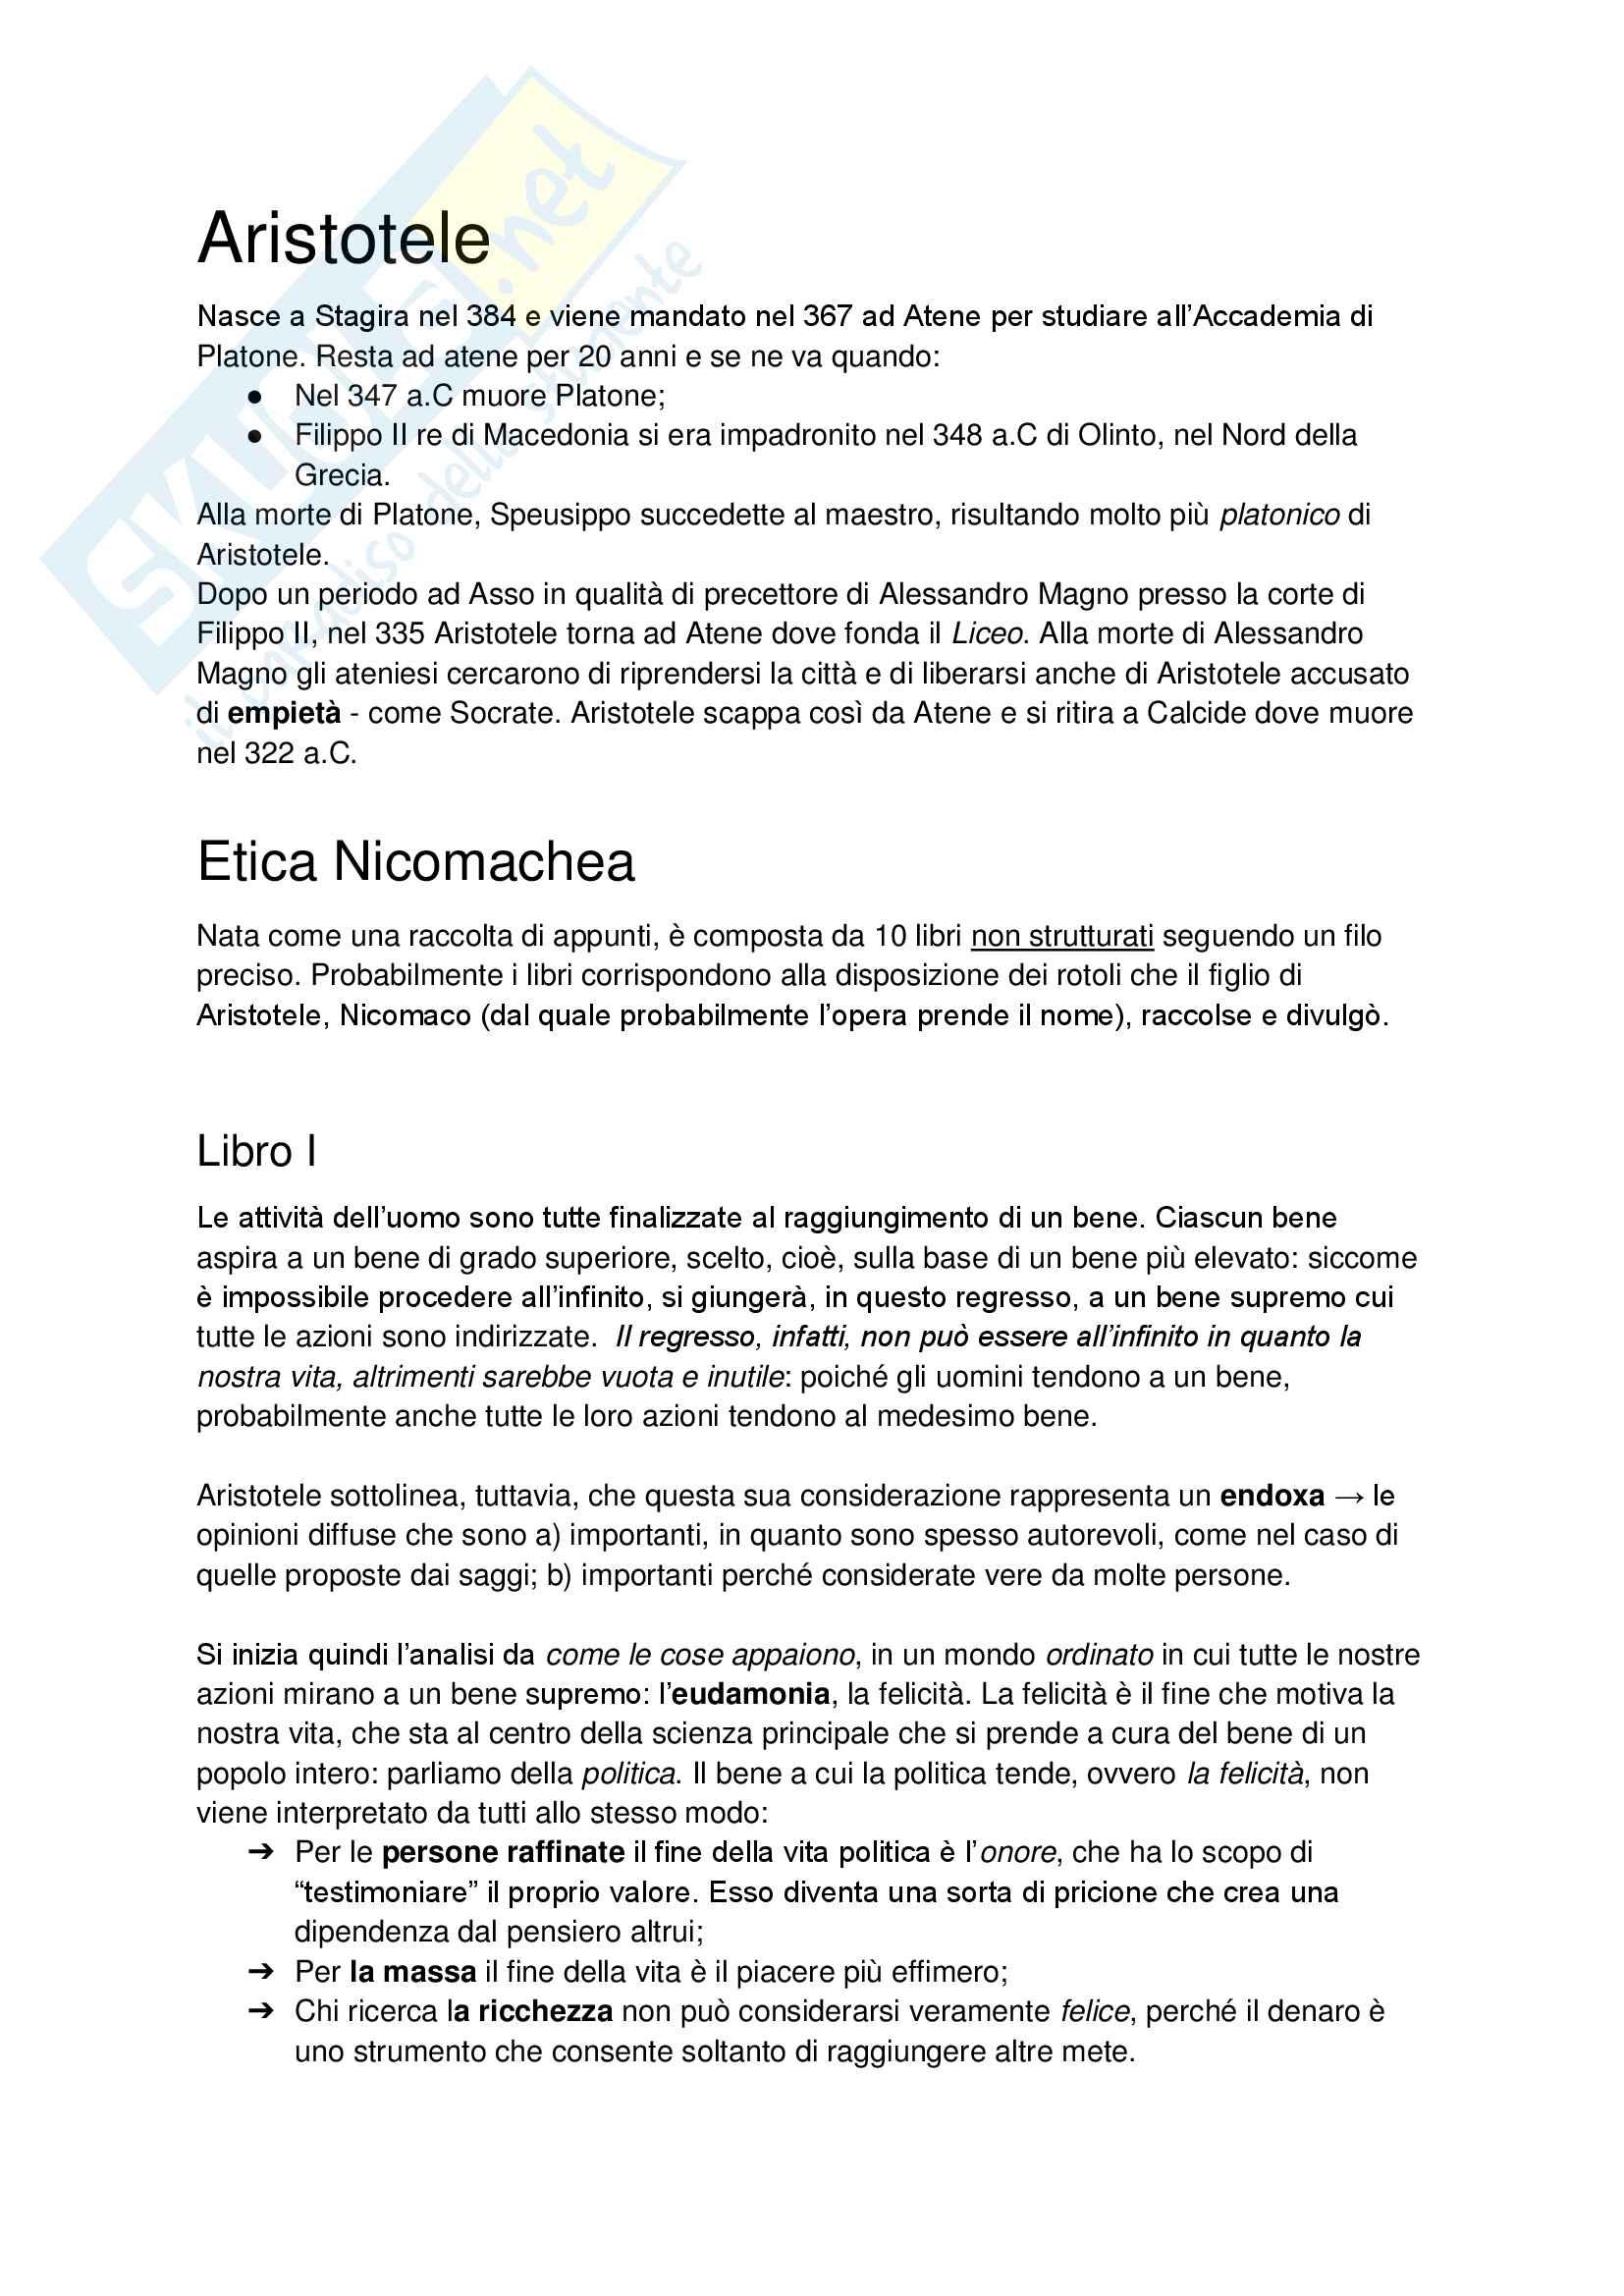 Etica Nicomachea - Aristotele Pag. 1